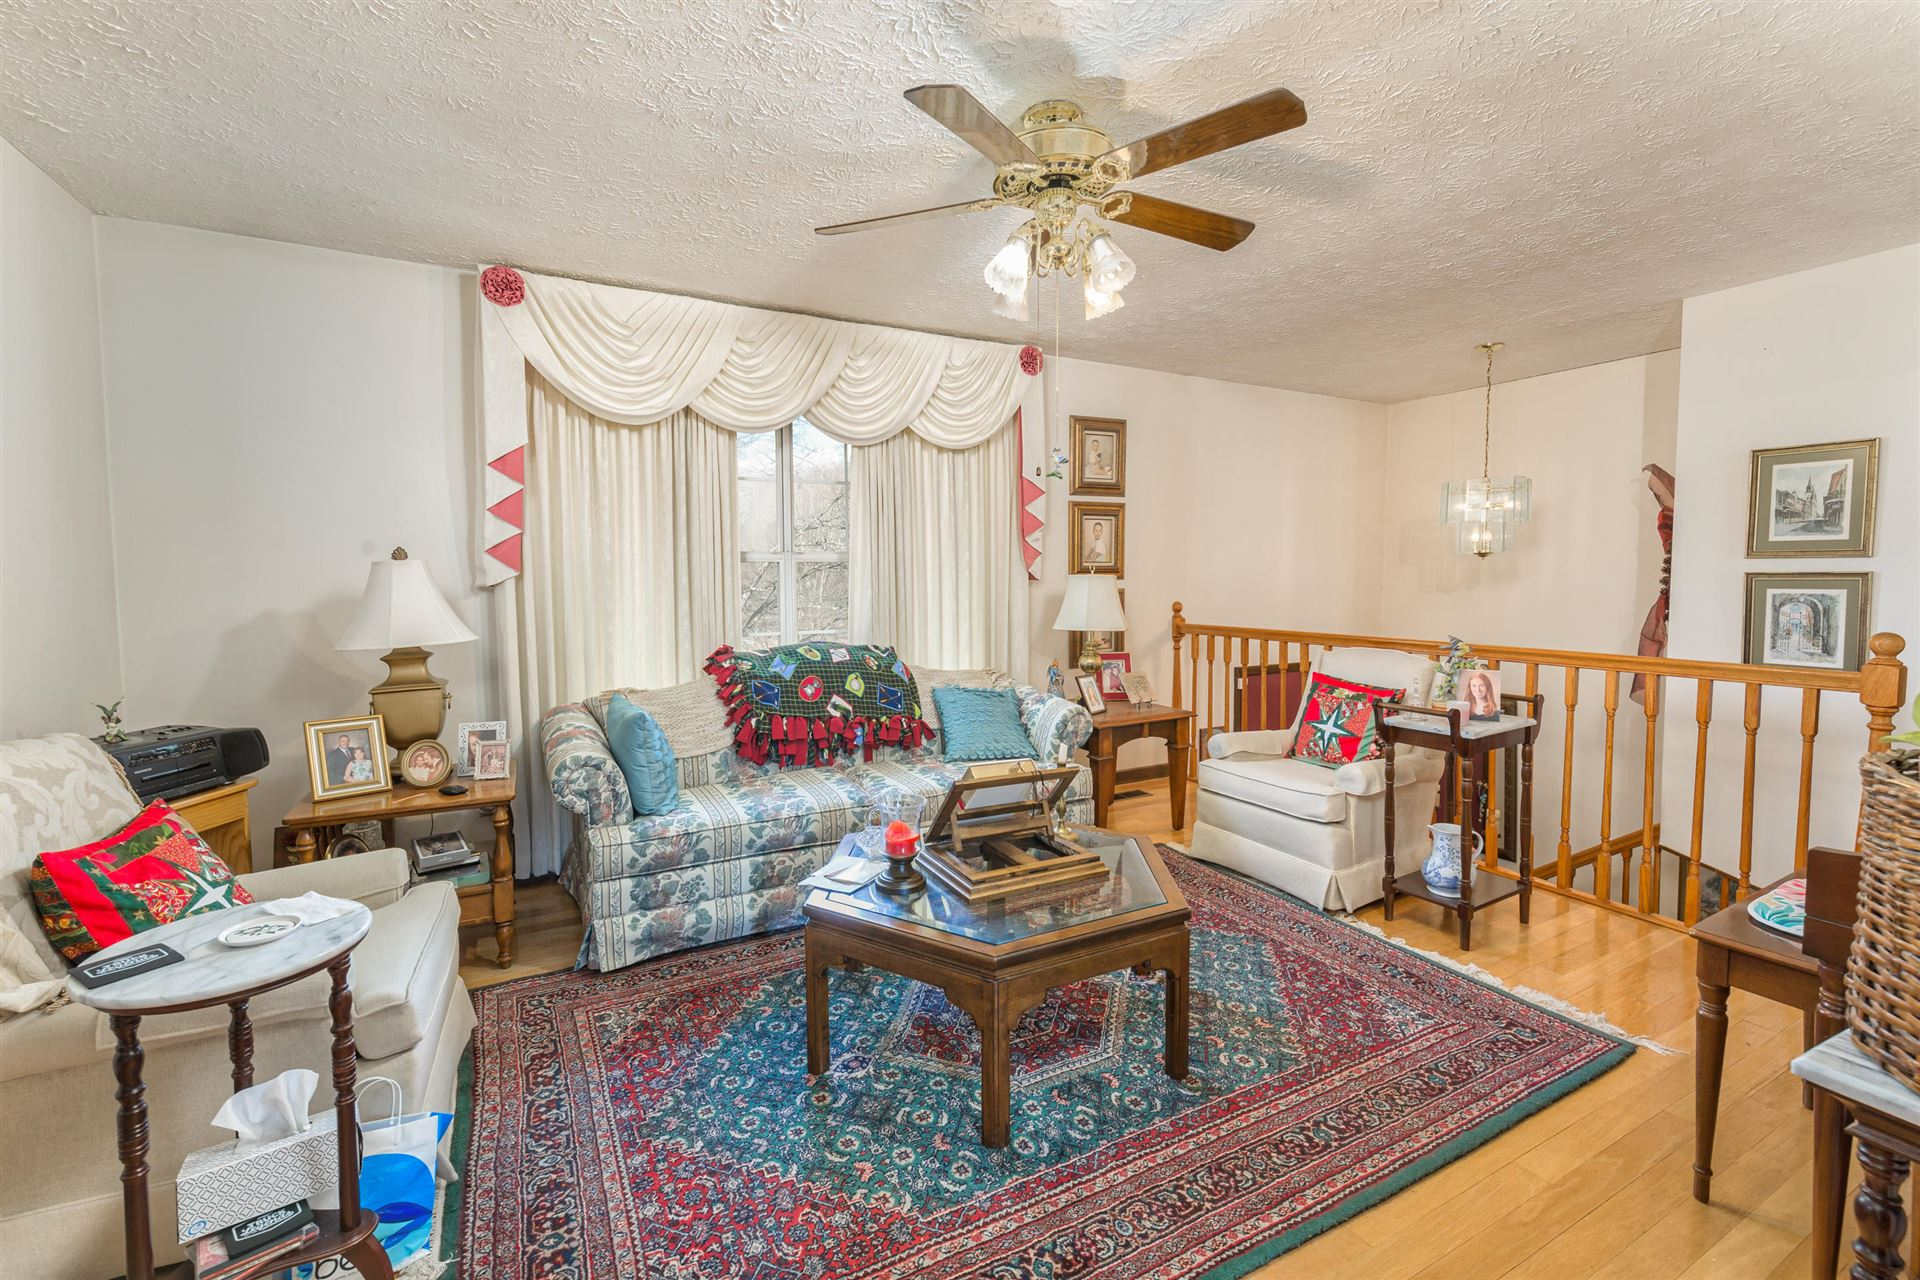 Photo of 608 Augustan Lane, Knoxville, TN 37934 (MLS # 1108321)